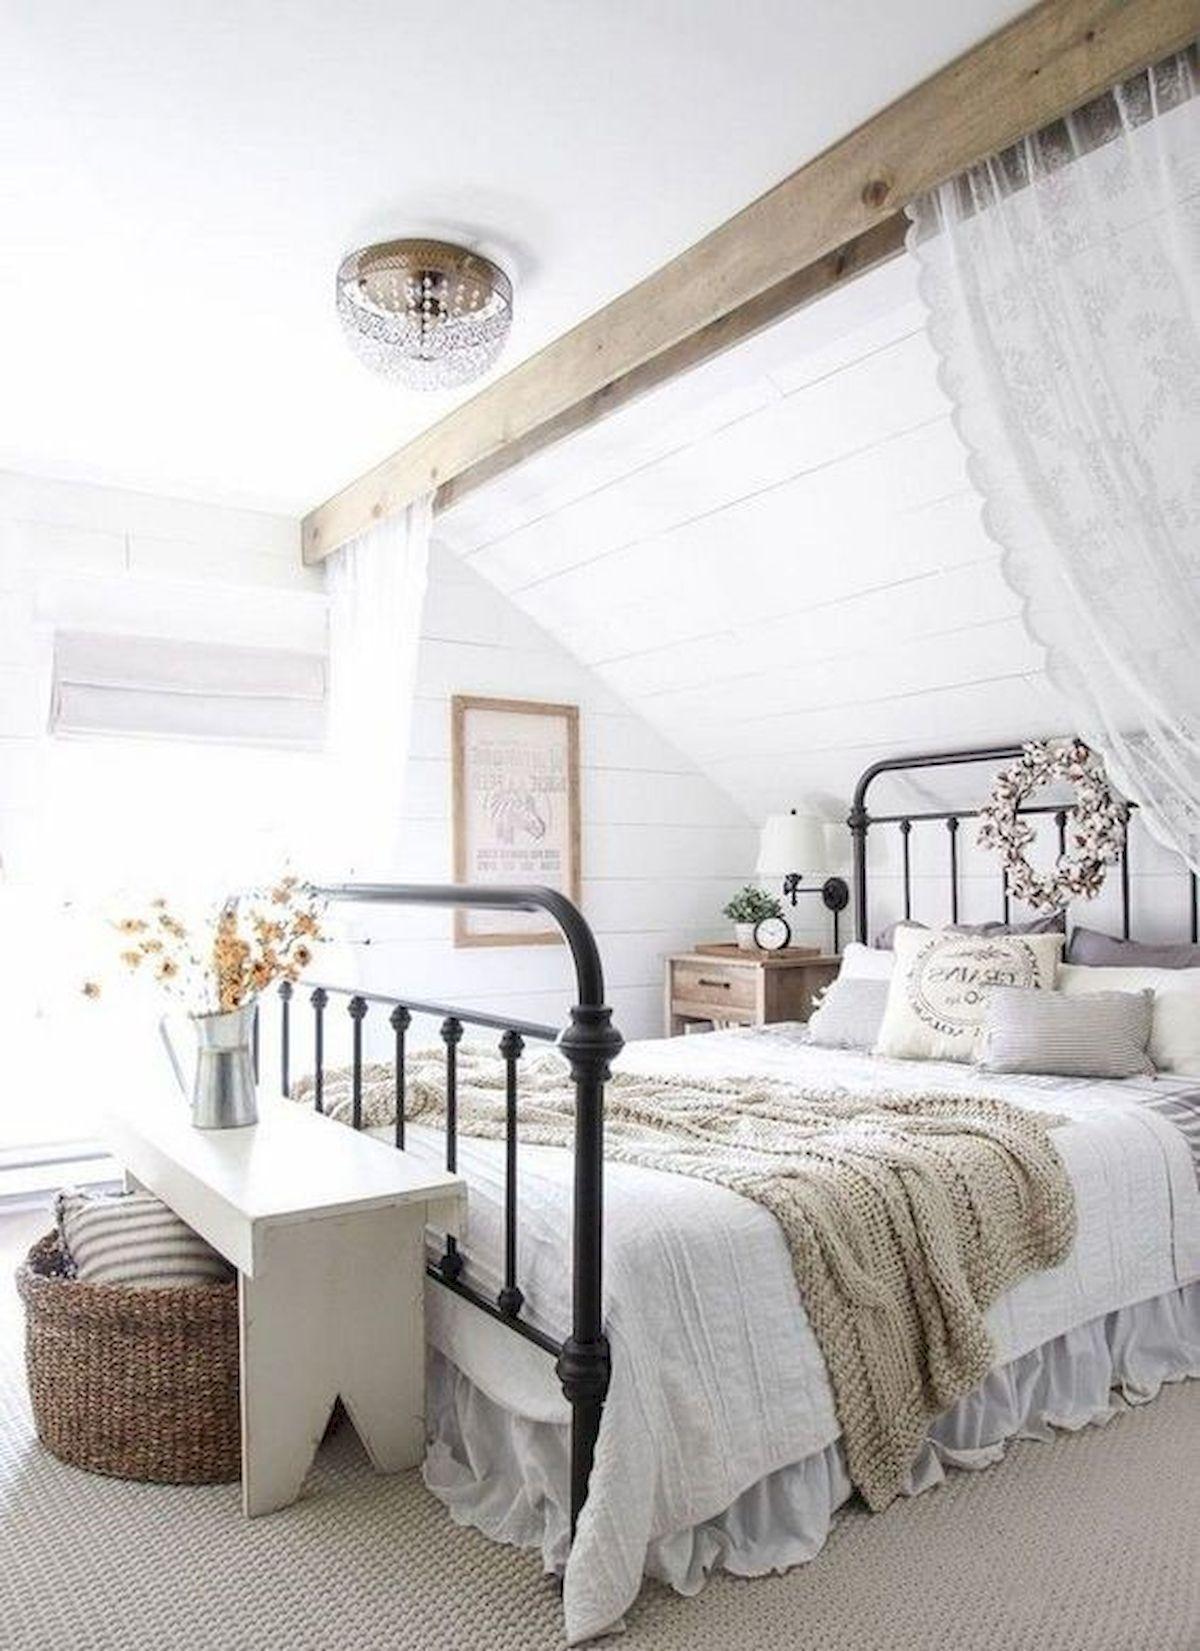 Adorable 33 Ideas For Modern Farmhouse Bedroom Source Https 33decor Com 33 Ideas For Mo Rustic Style Bedroom Farmhouse Style Master Bedroom Remodel Bedroom